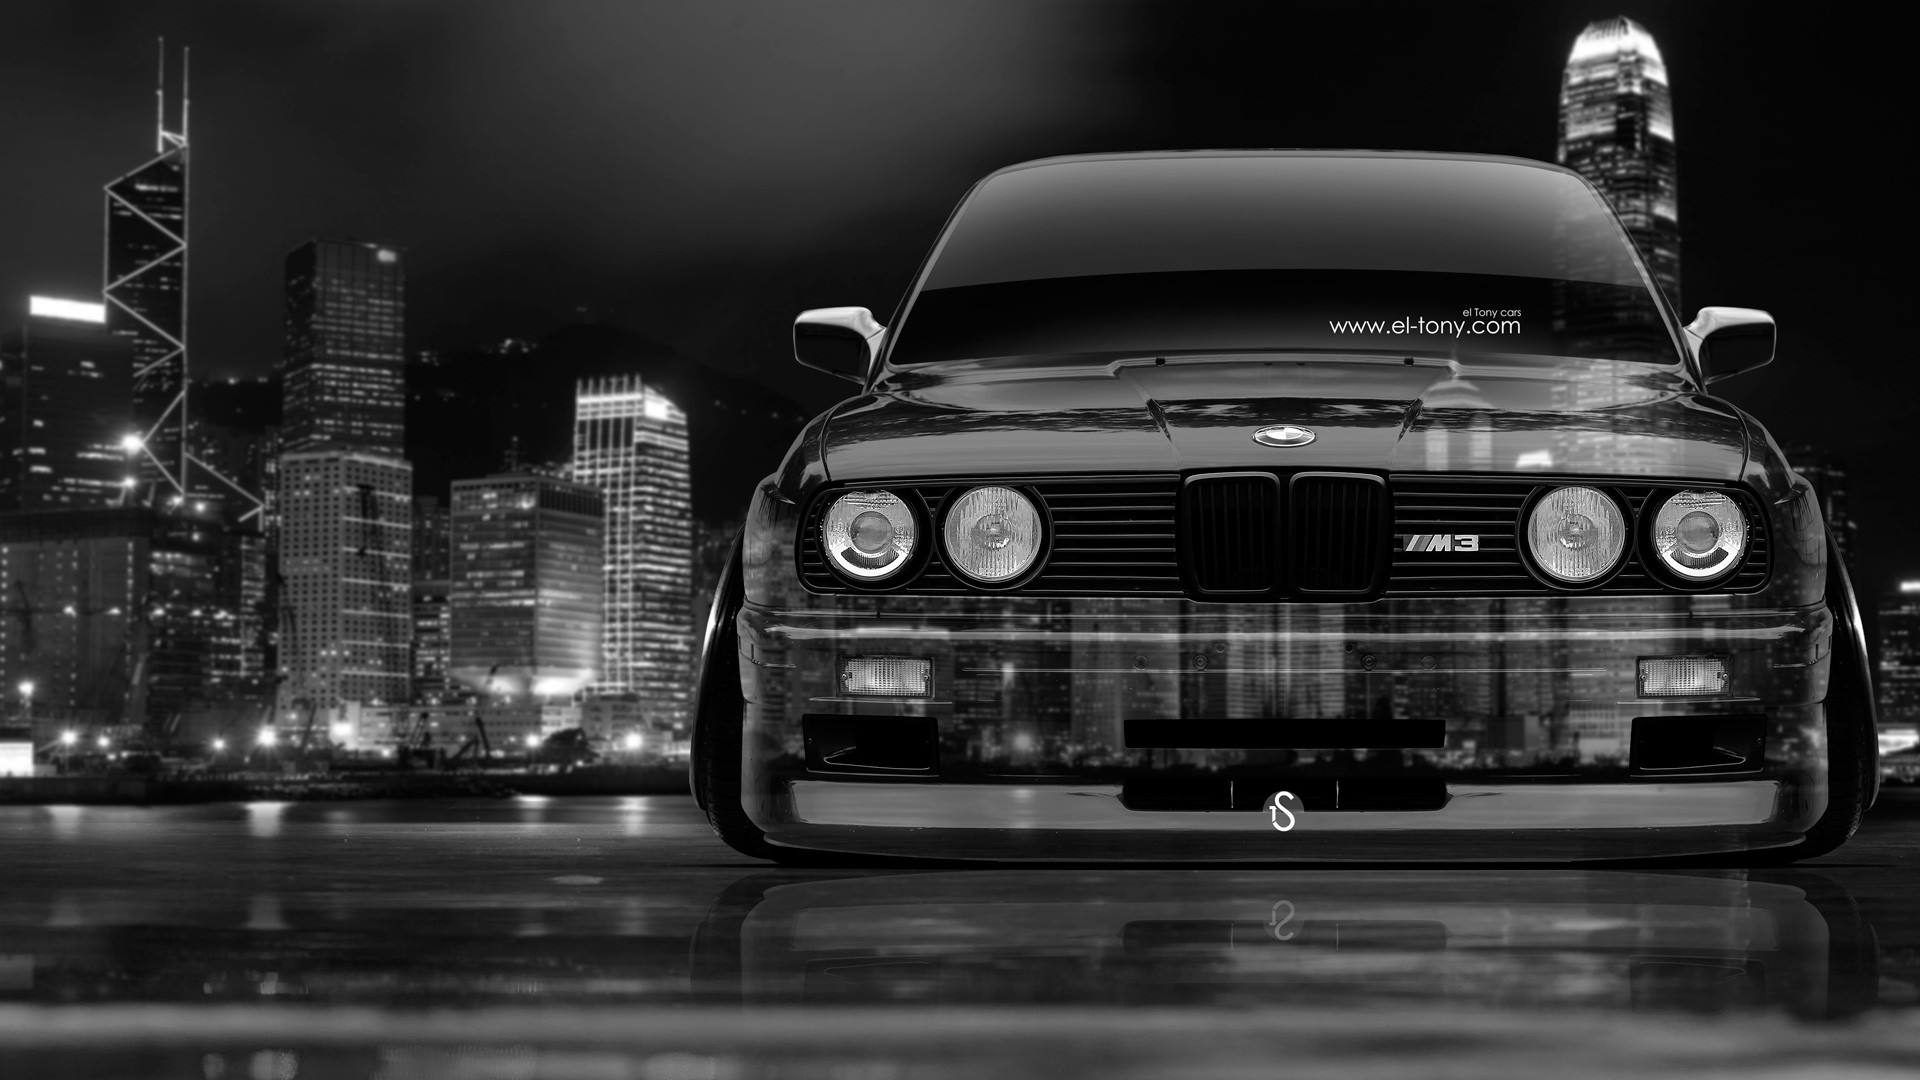 4k bmw i8 front crystal city car 2014 bmw x6 front crystal city car .